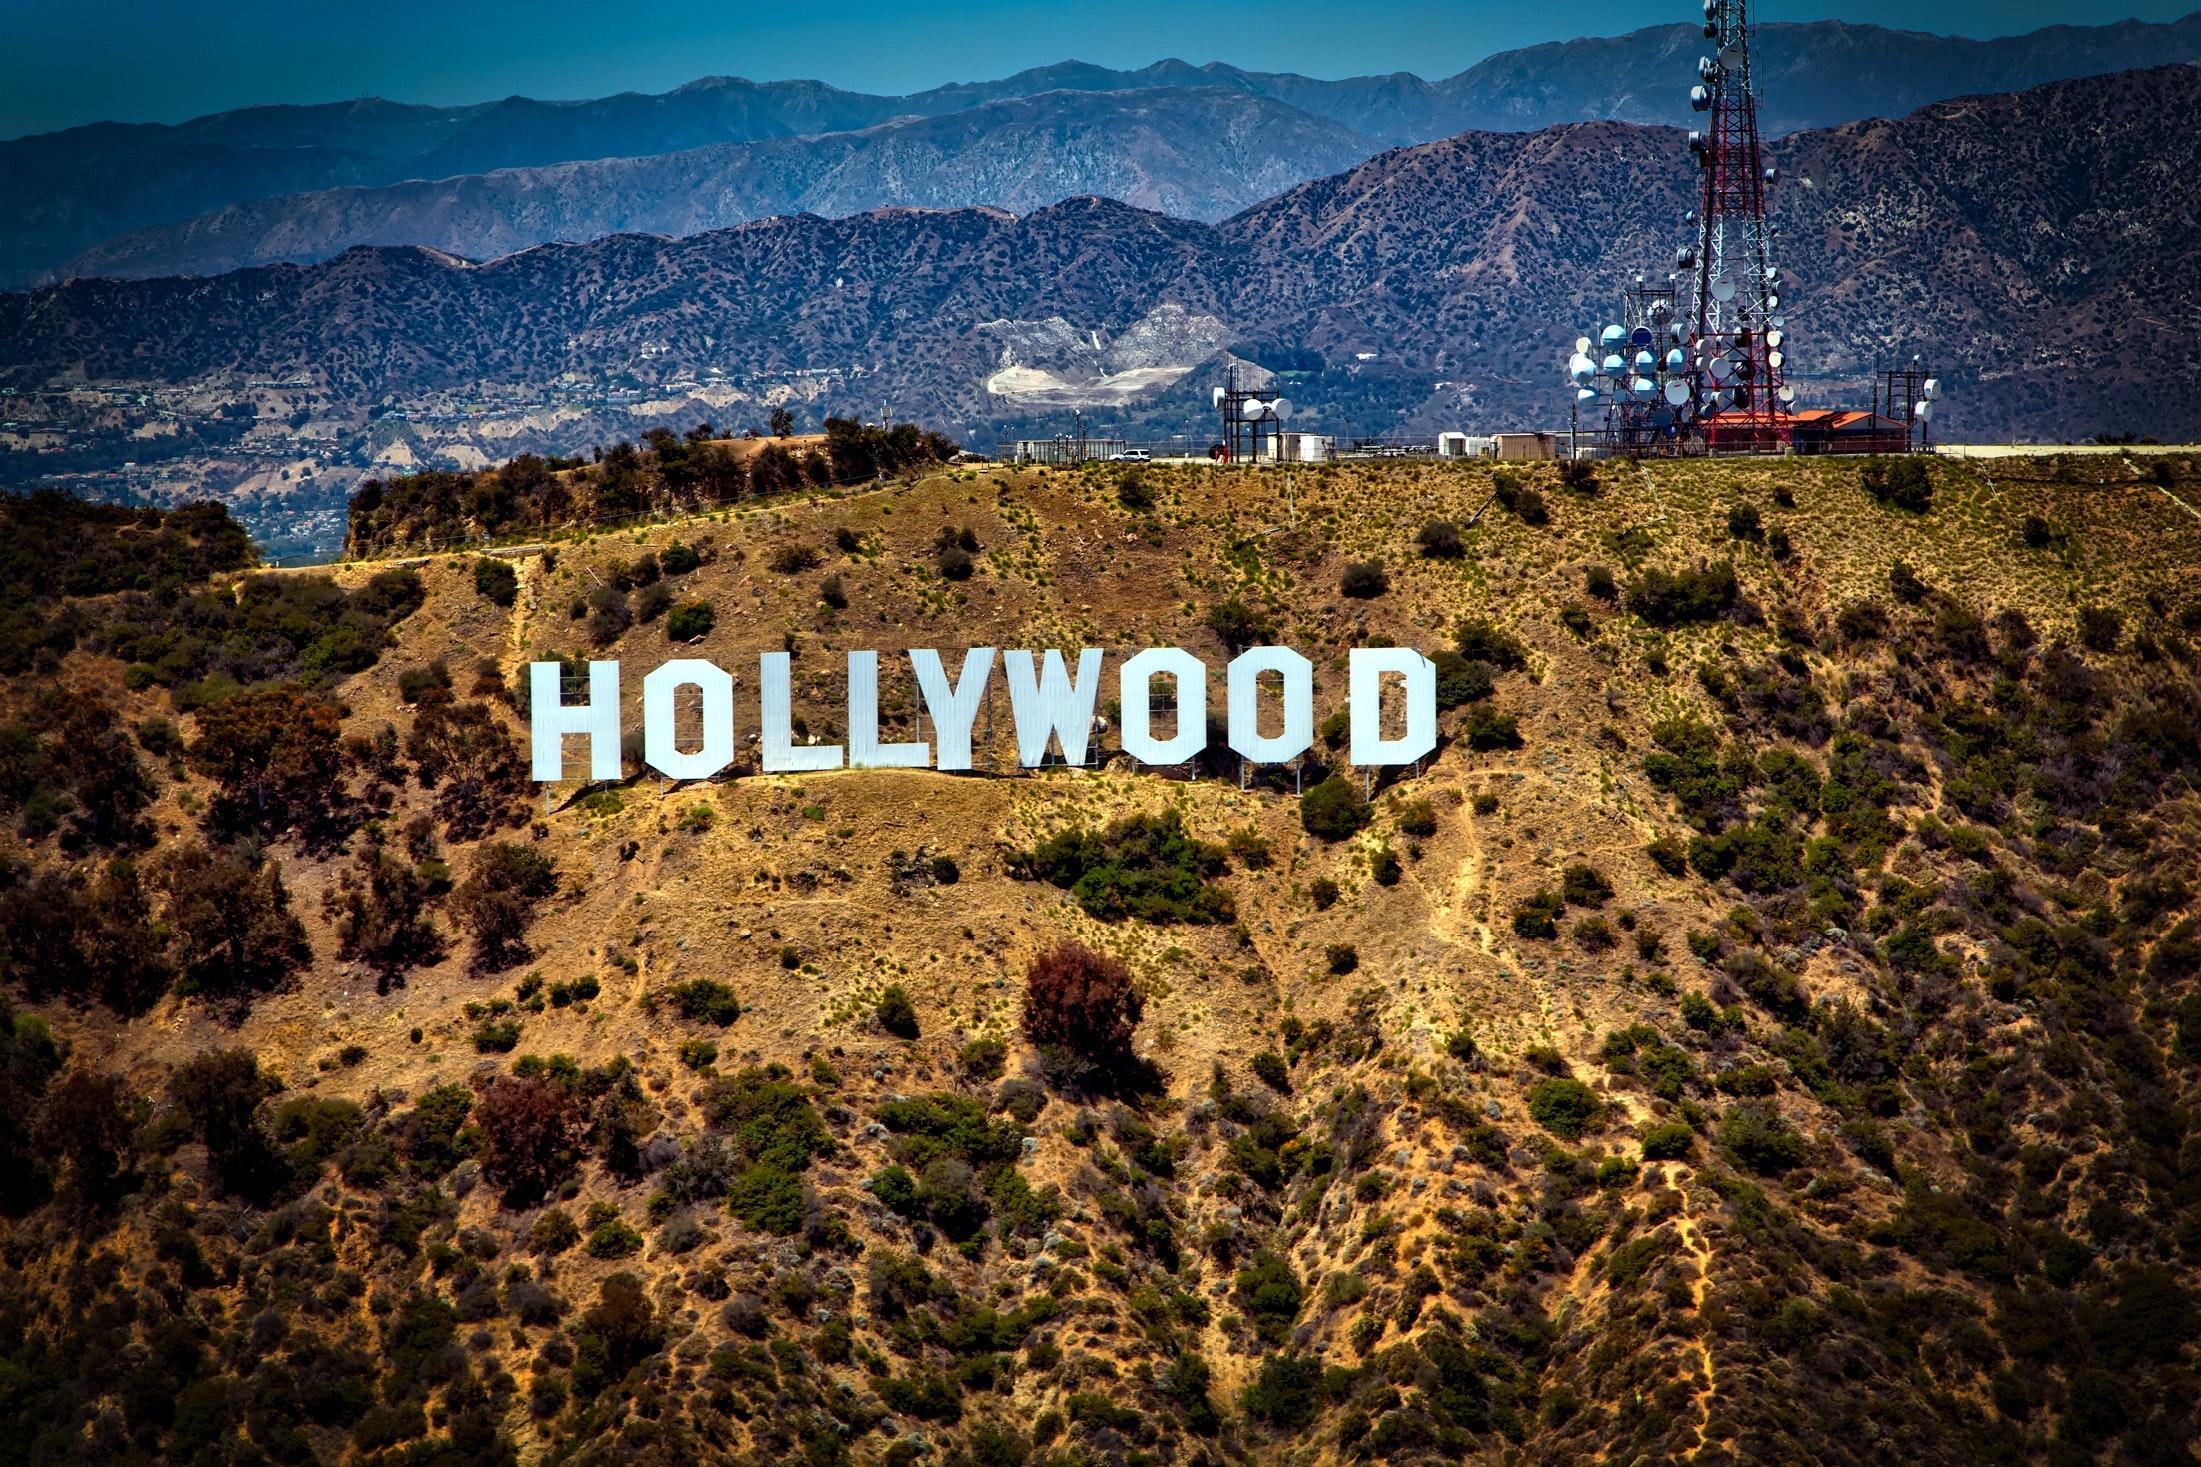 california-hill-hollywood-164183.jpg